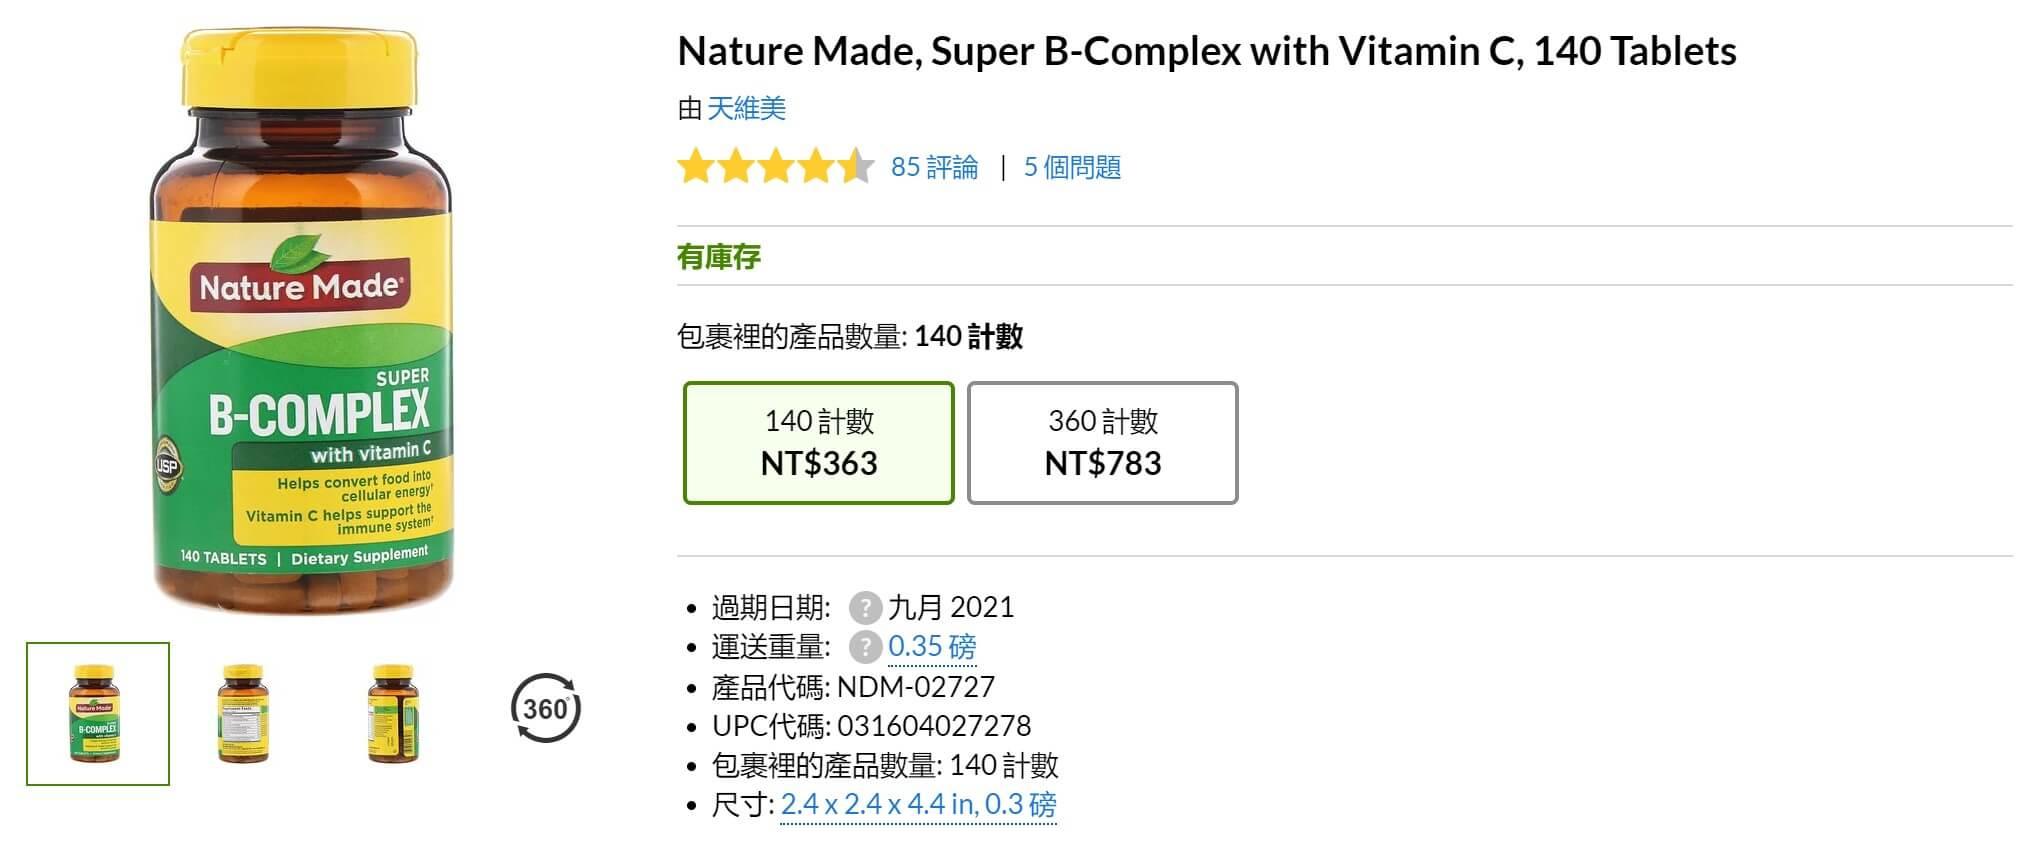 Nature Made, Super B-Complex with Vitamin C